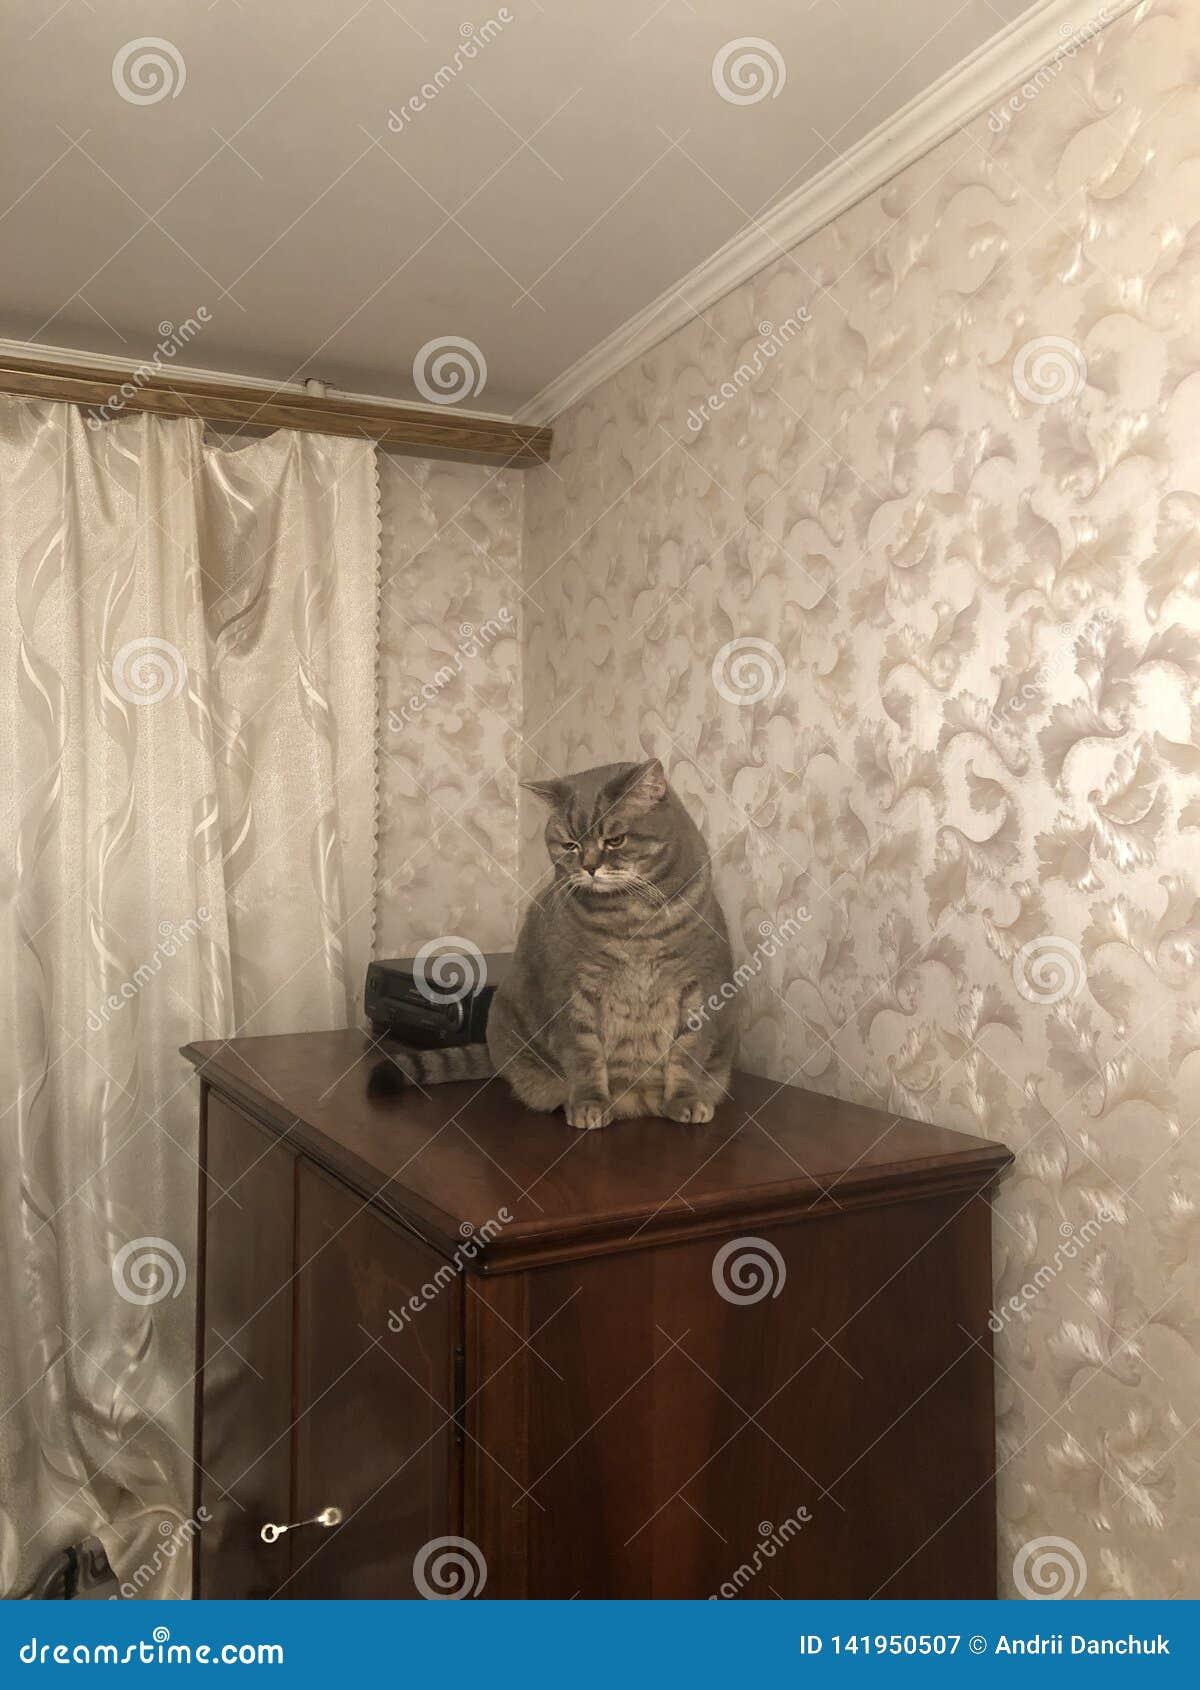 Sad gray cat sitting on the linen closet. Pet